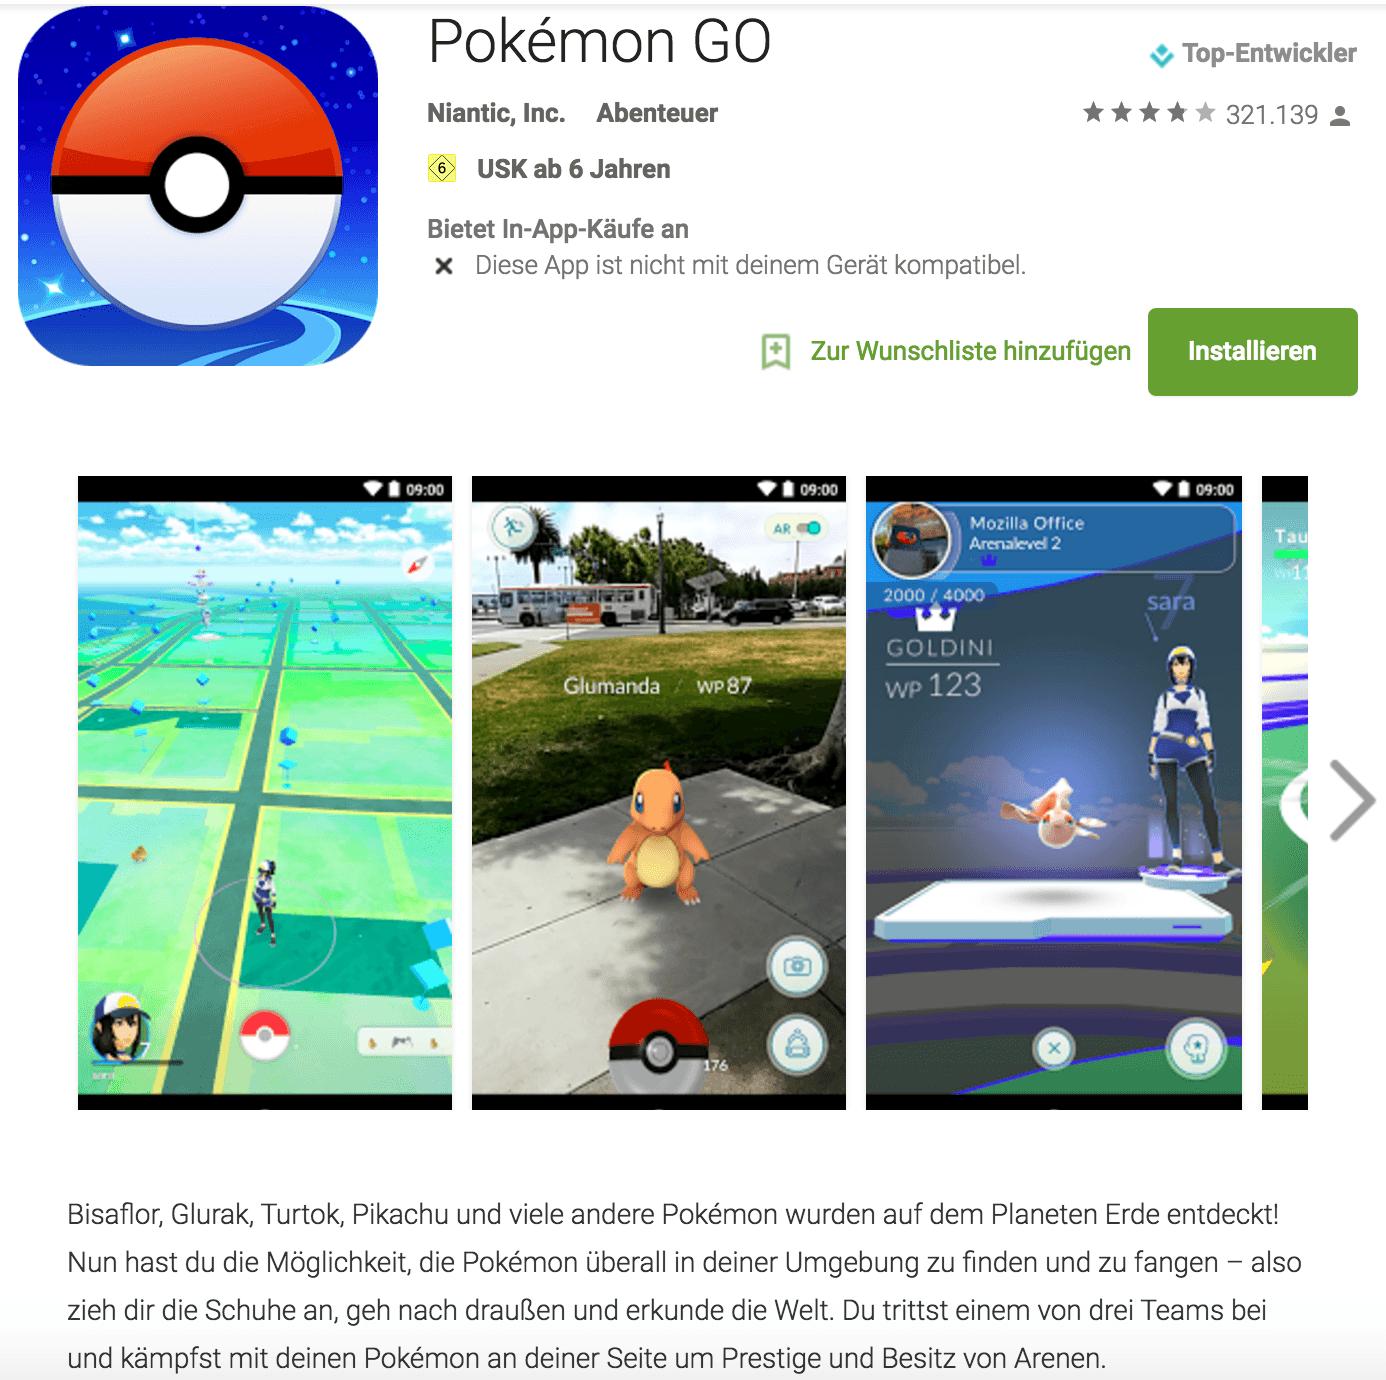 Screenshot 2016-07-13 10.11.08.png